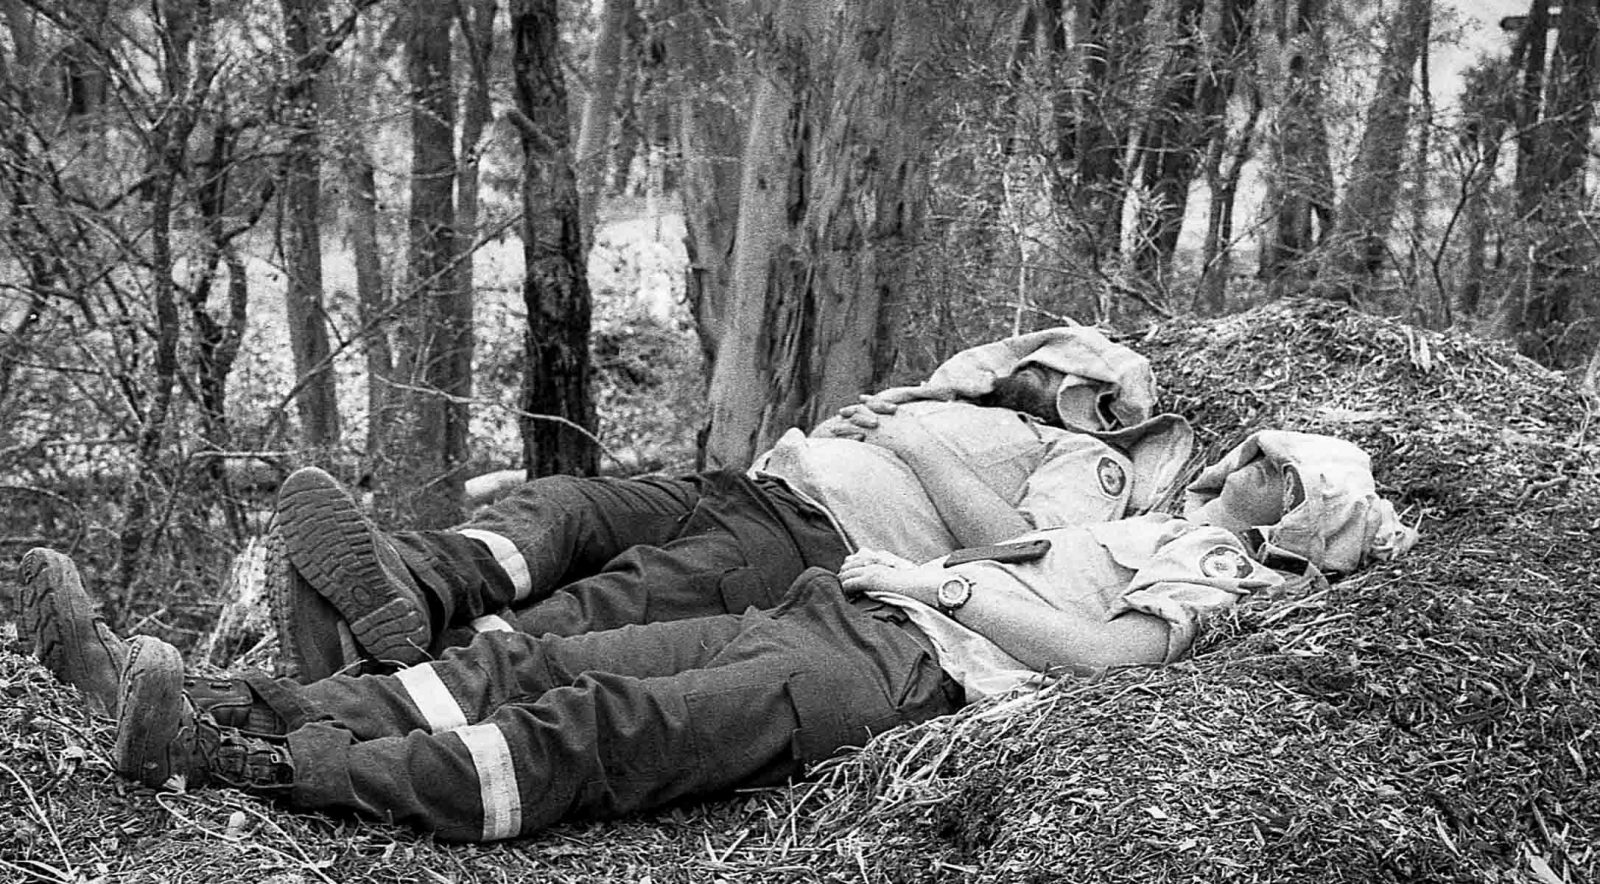 The Australian NSW bushfires on film - Sleeping